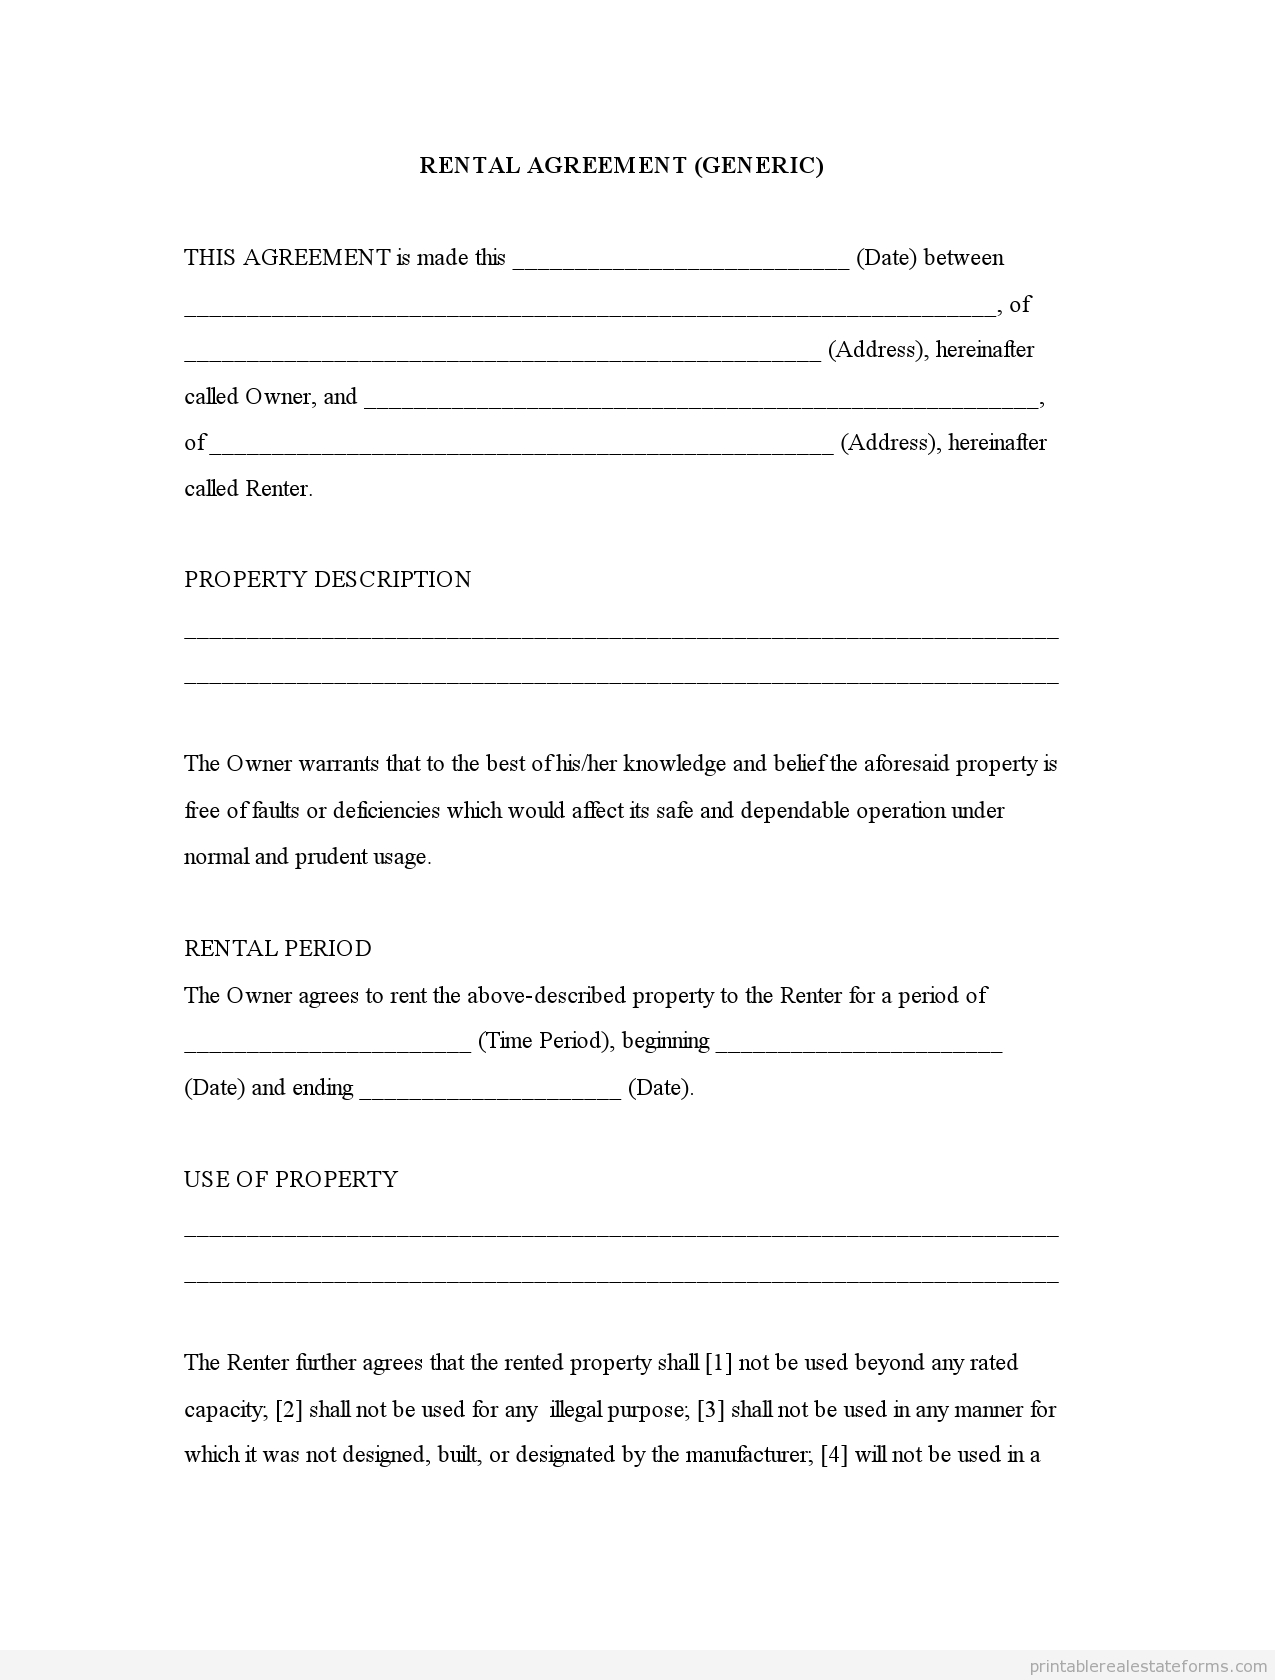 Free Printable Rental Agreement | Rental Agreement (Generic)0001 - Free Printable Lease Agreement Forms